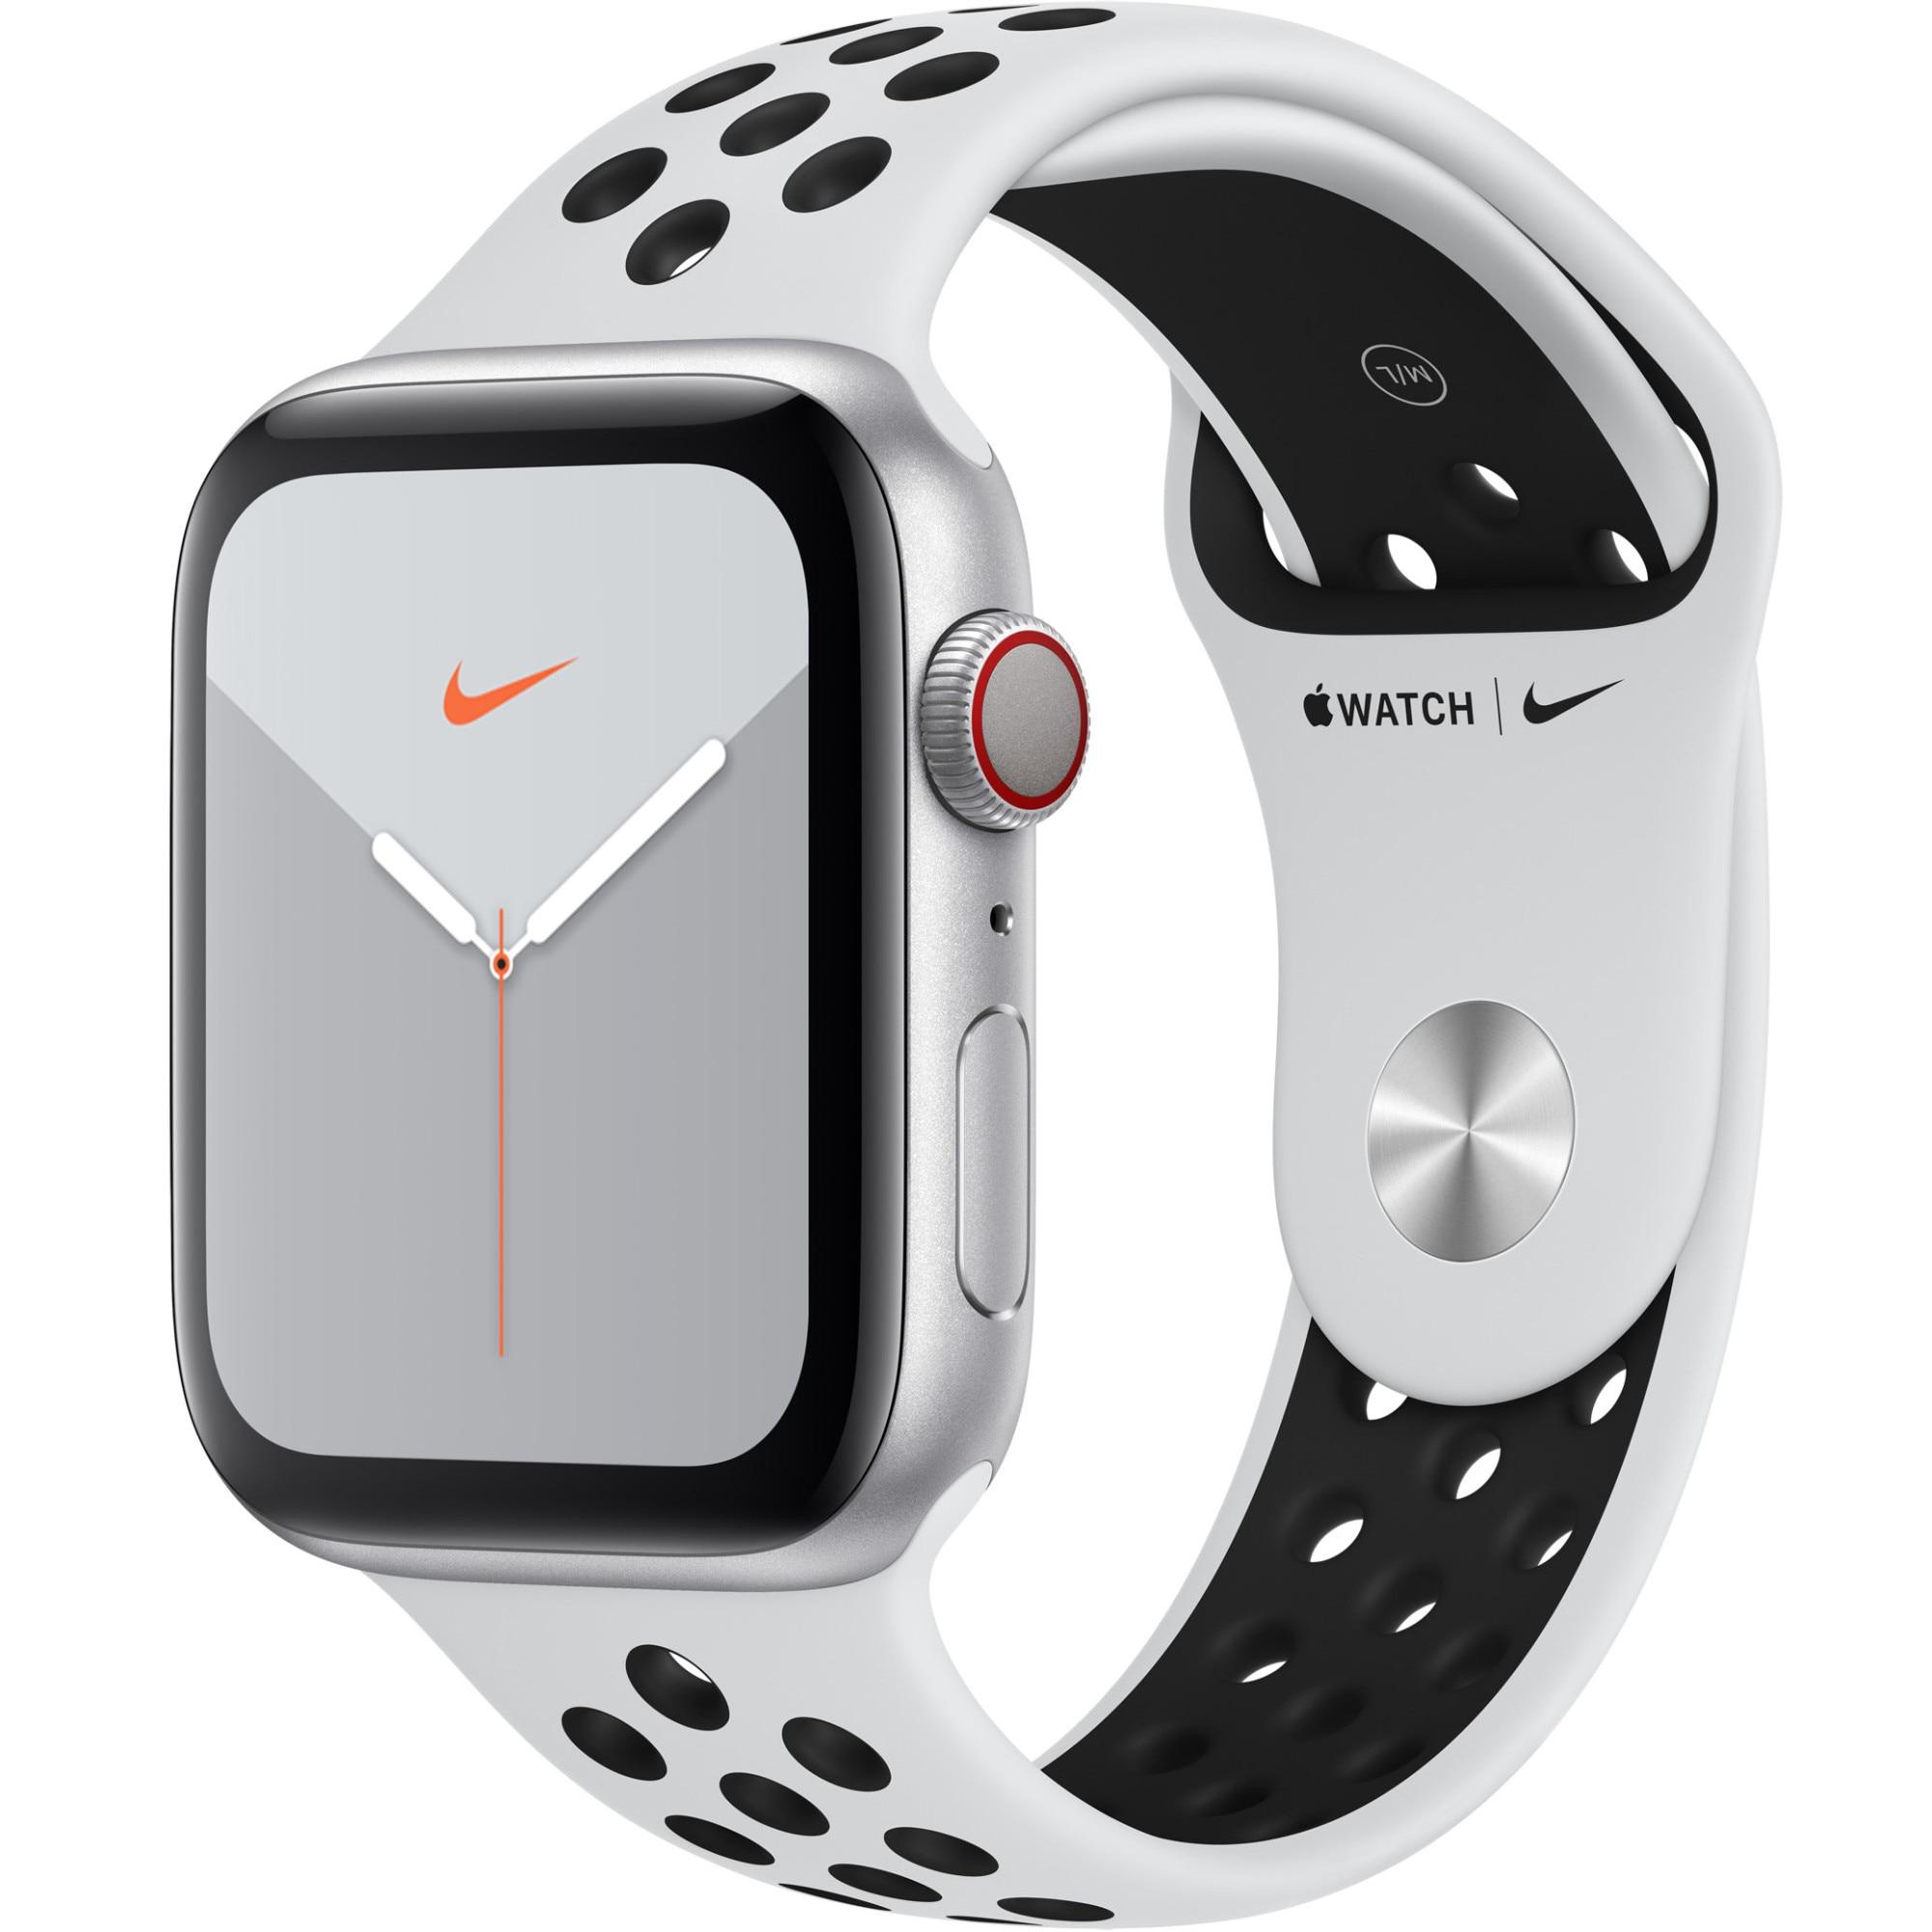 Fotografie Apple Watch Nike 5, GPS, Cellular, Carcasa Silver Aluminium 44mm, Pure Platinum/Black Nike Sport Band - S/M & M/L